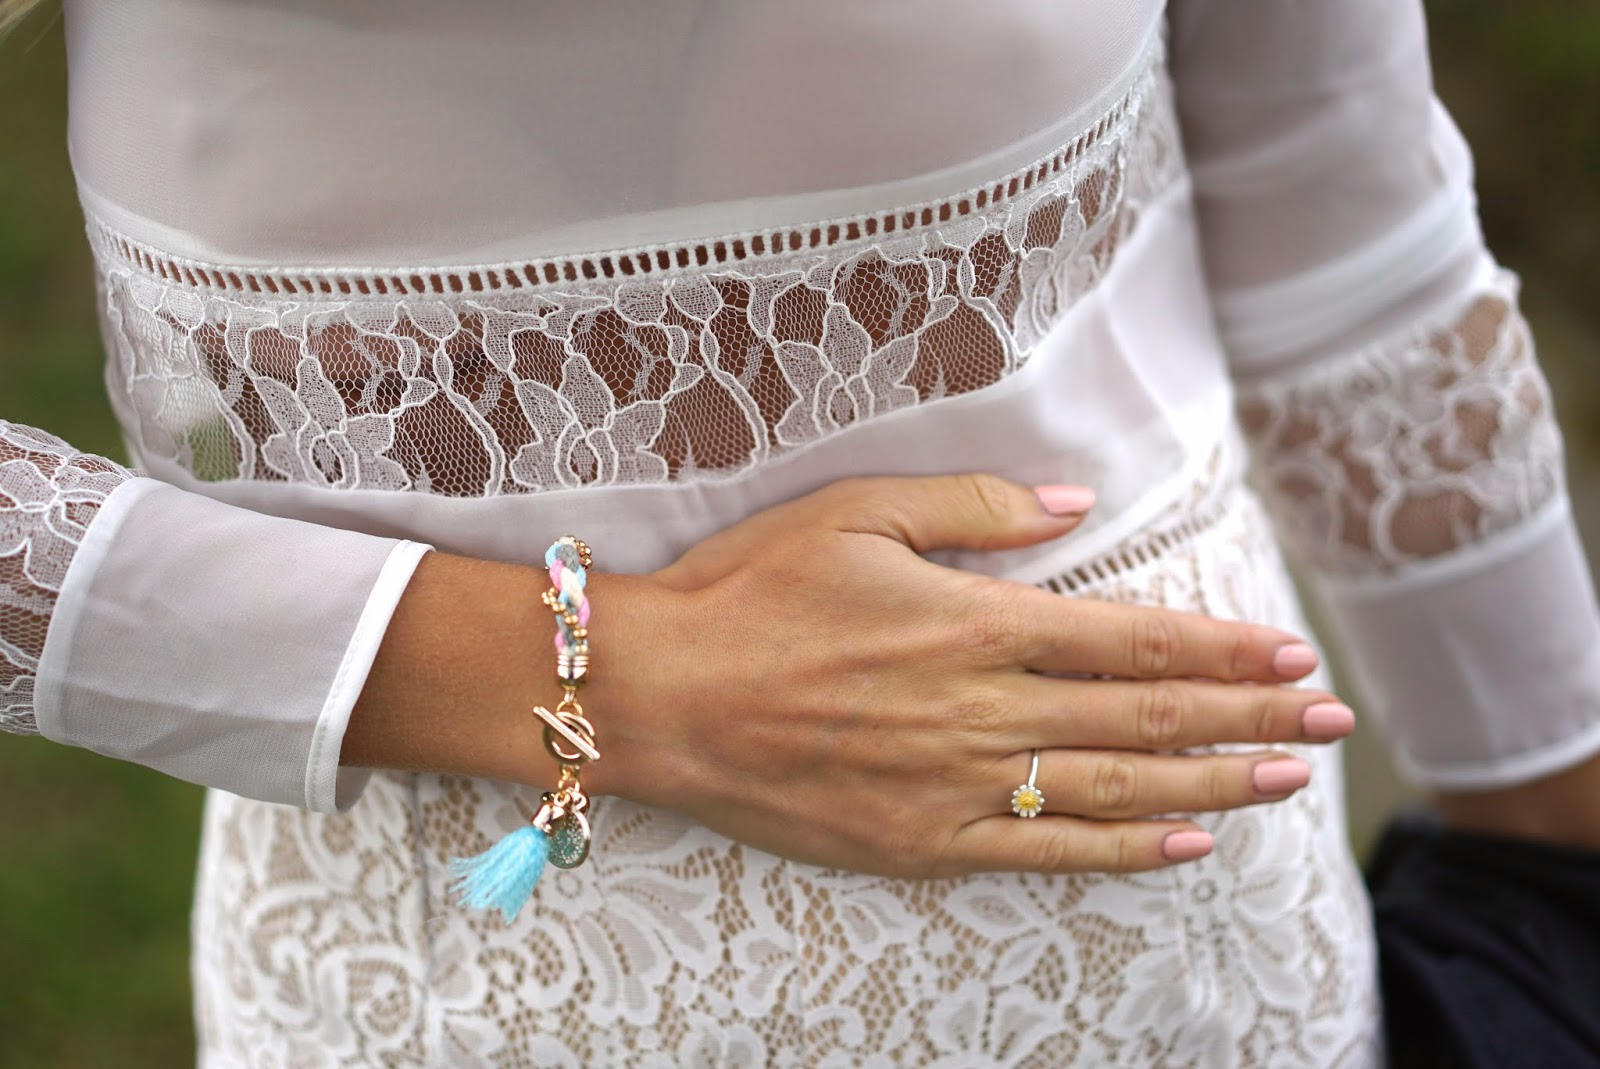 LVNDR jewellery